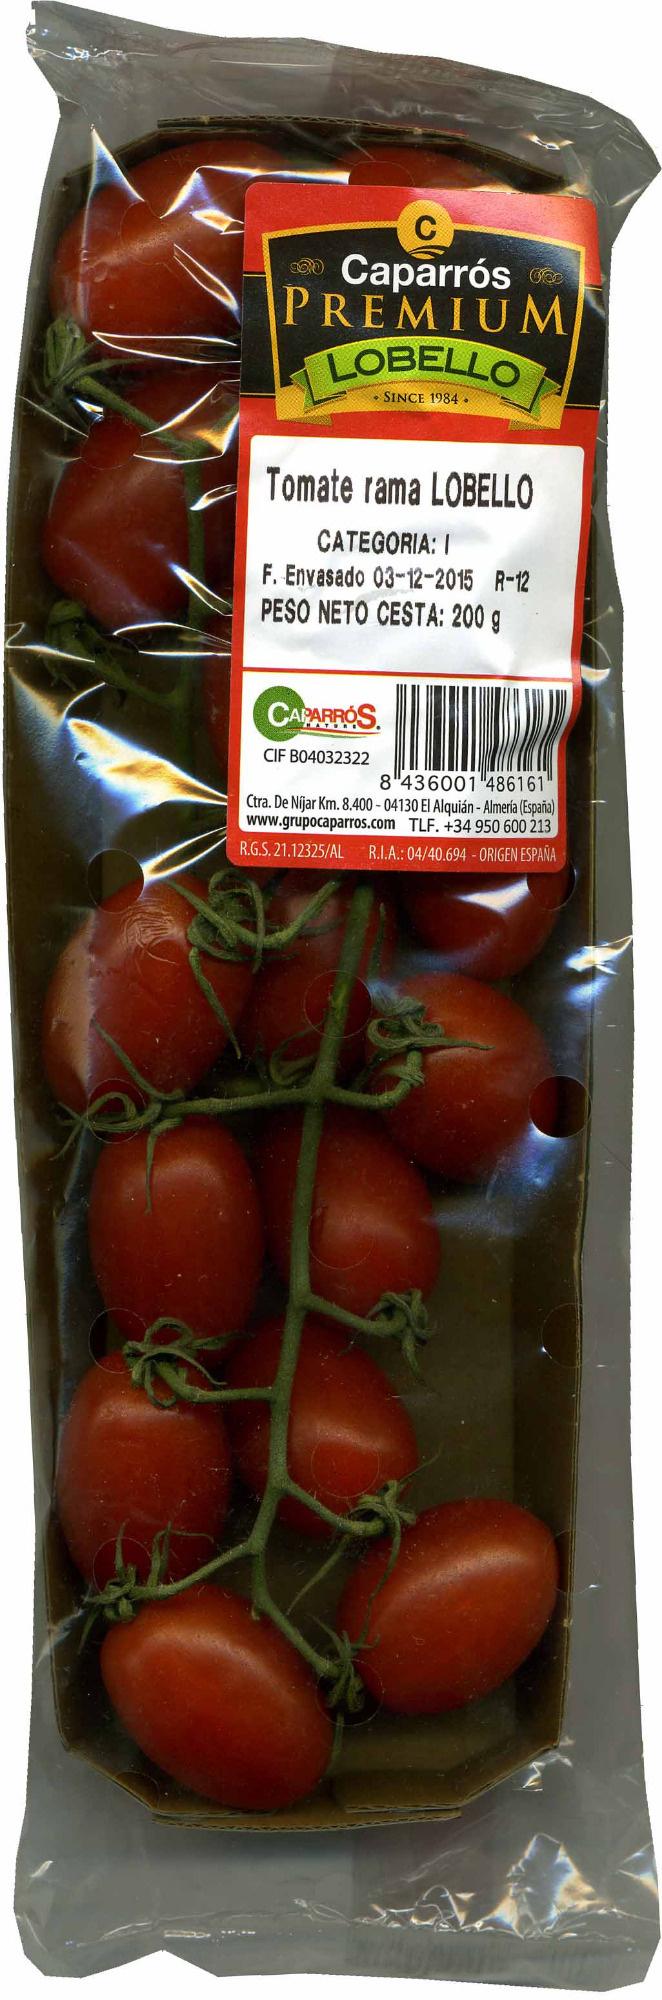 Tomates cherry pera en rama - Producto - es